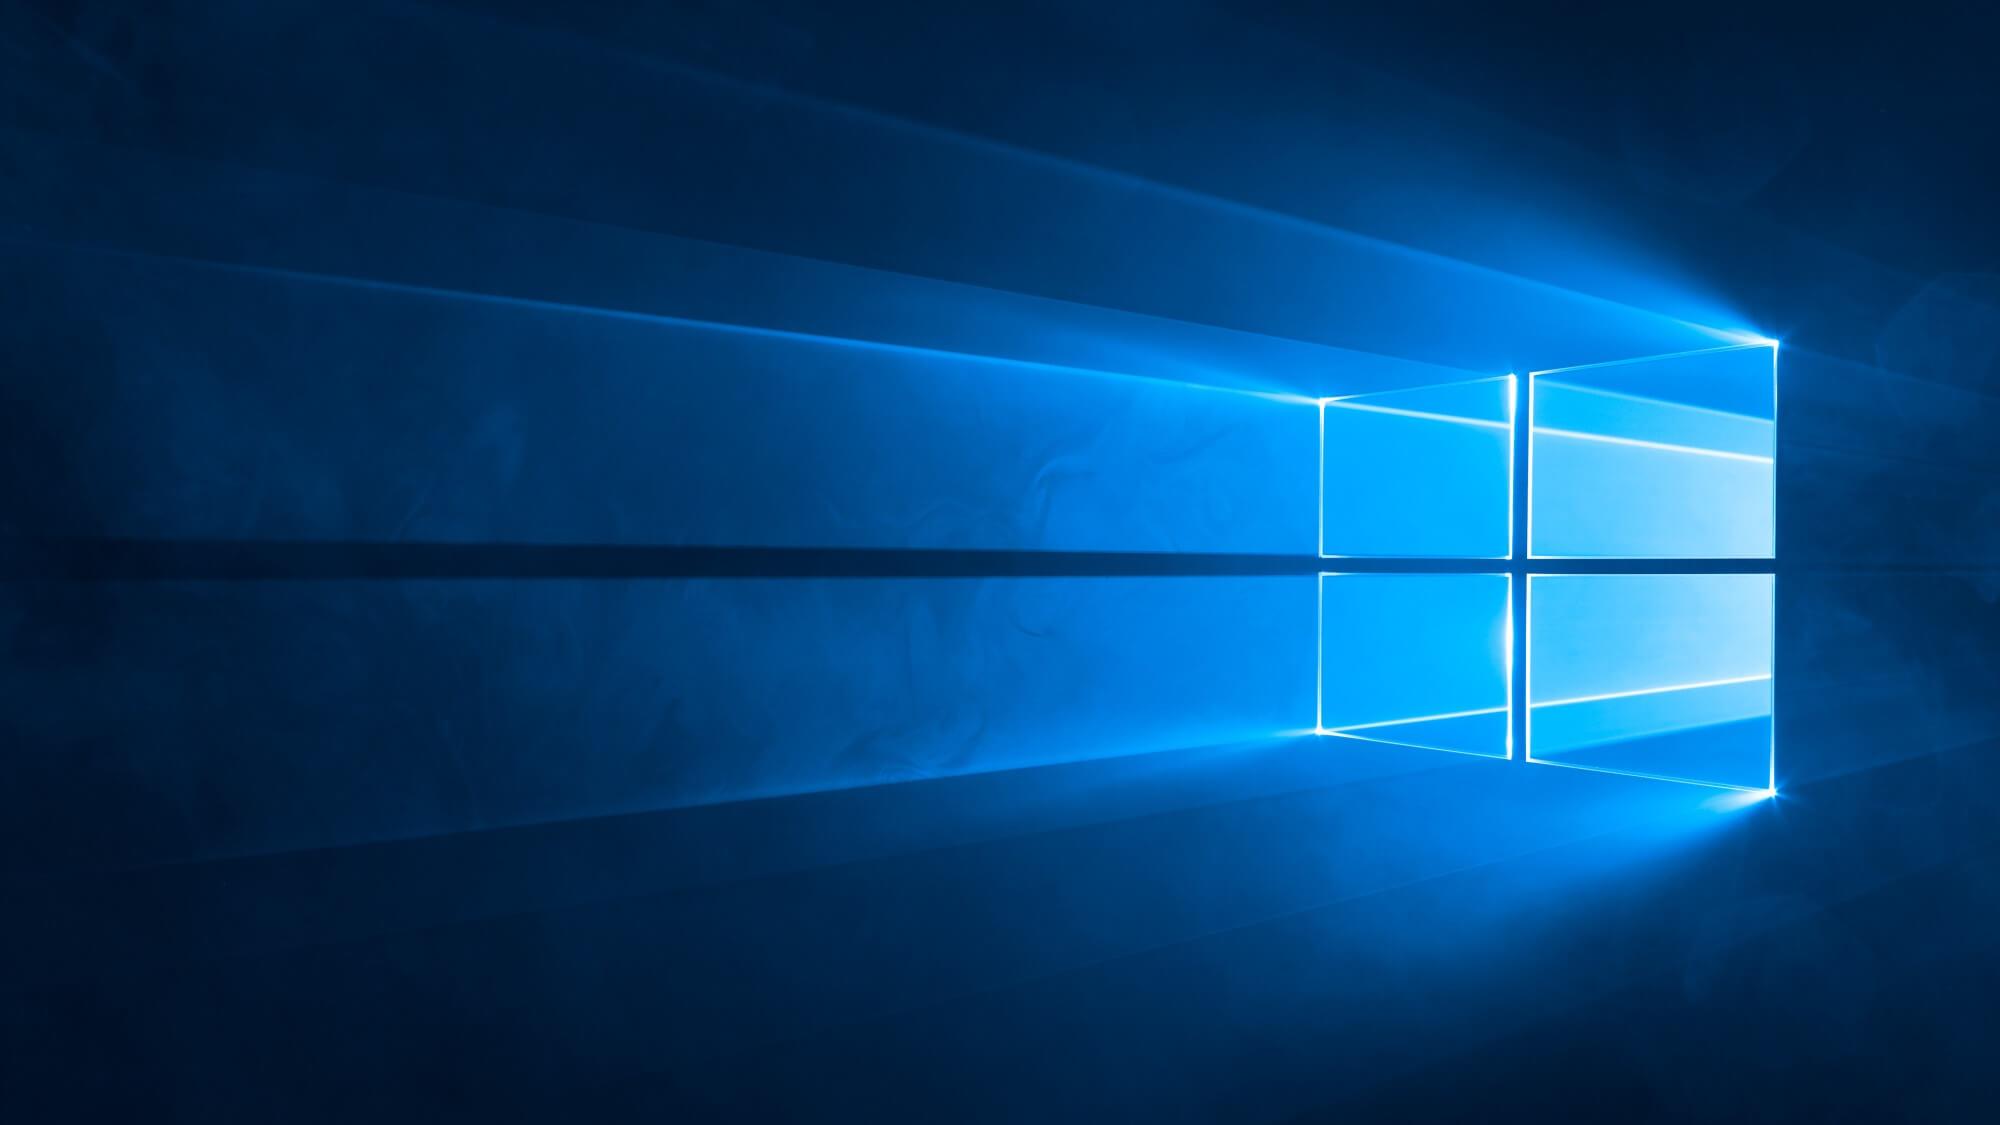 windows 10 petition